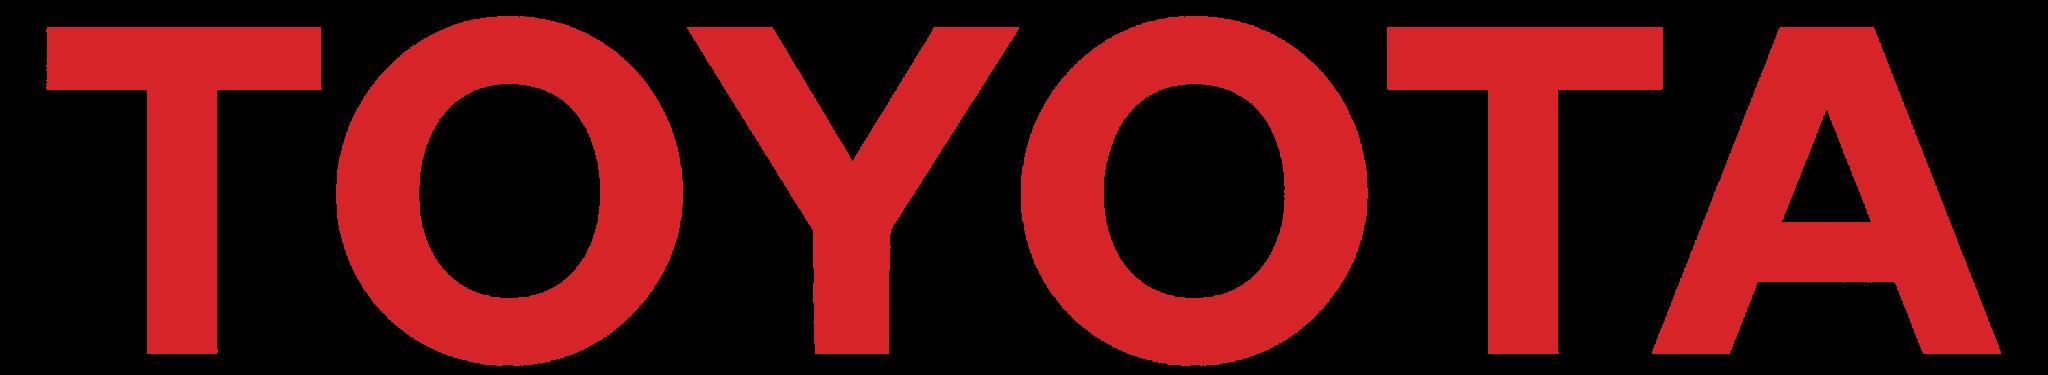 Graduate Trainee Program Toyota Uganda Jobs